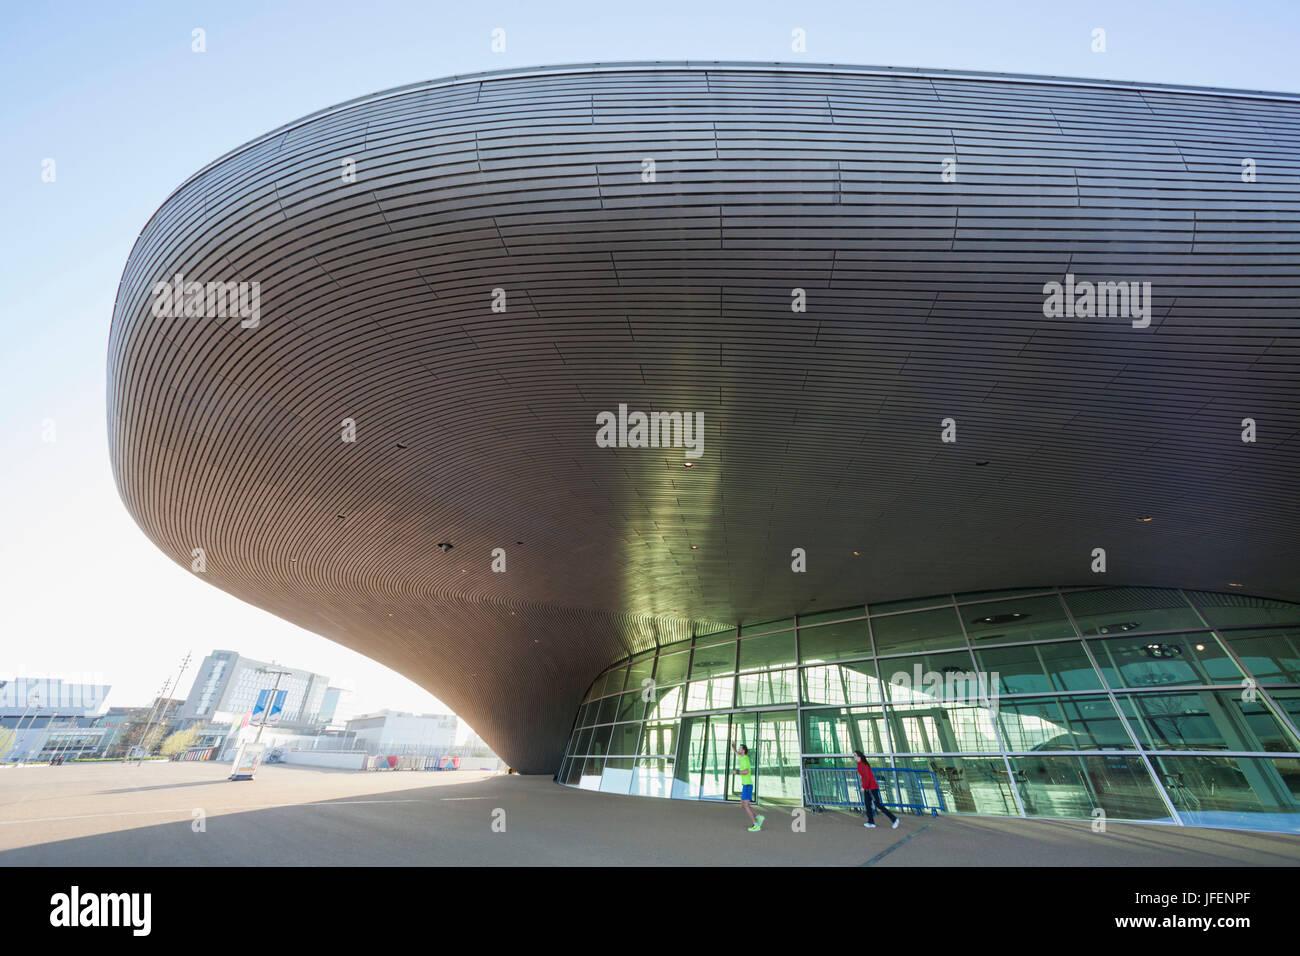 England, London, Stratford, Queen Elizabeth Olympic Park, The Aquatics Centre - Stock Image